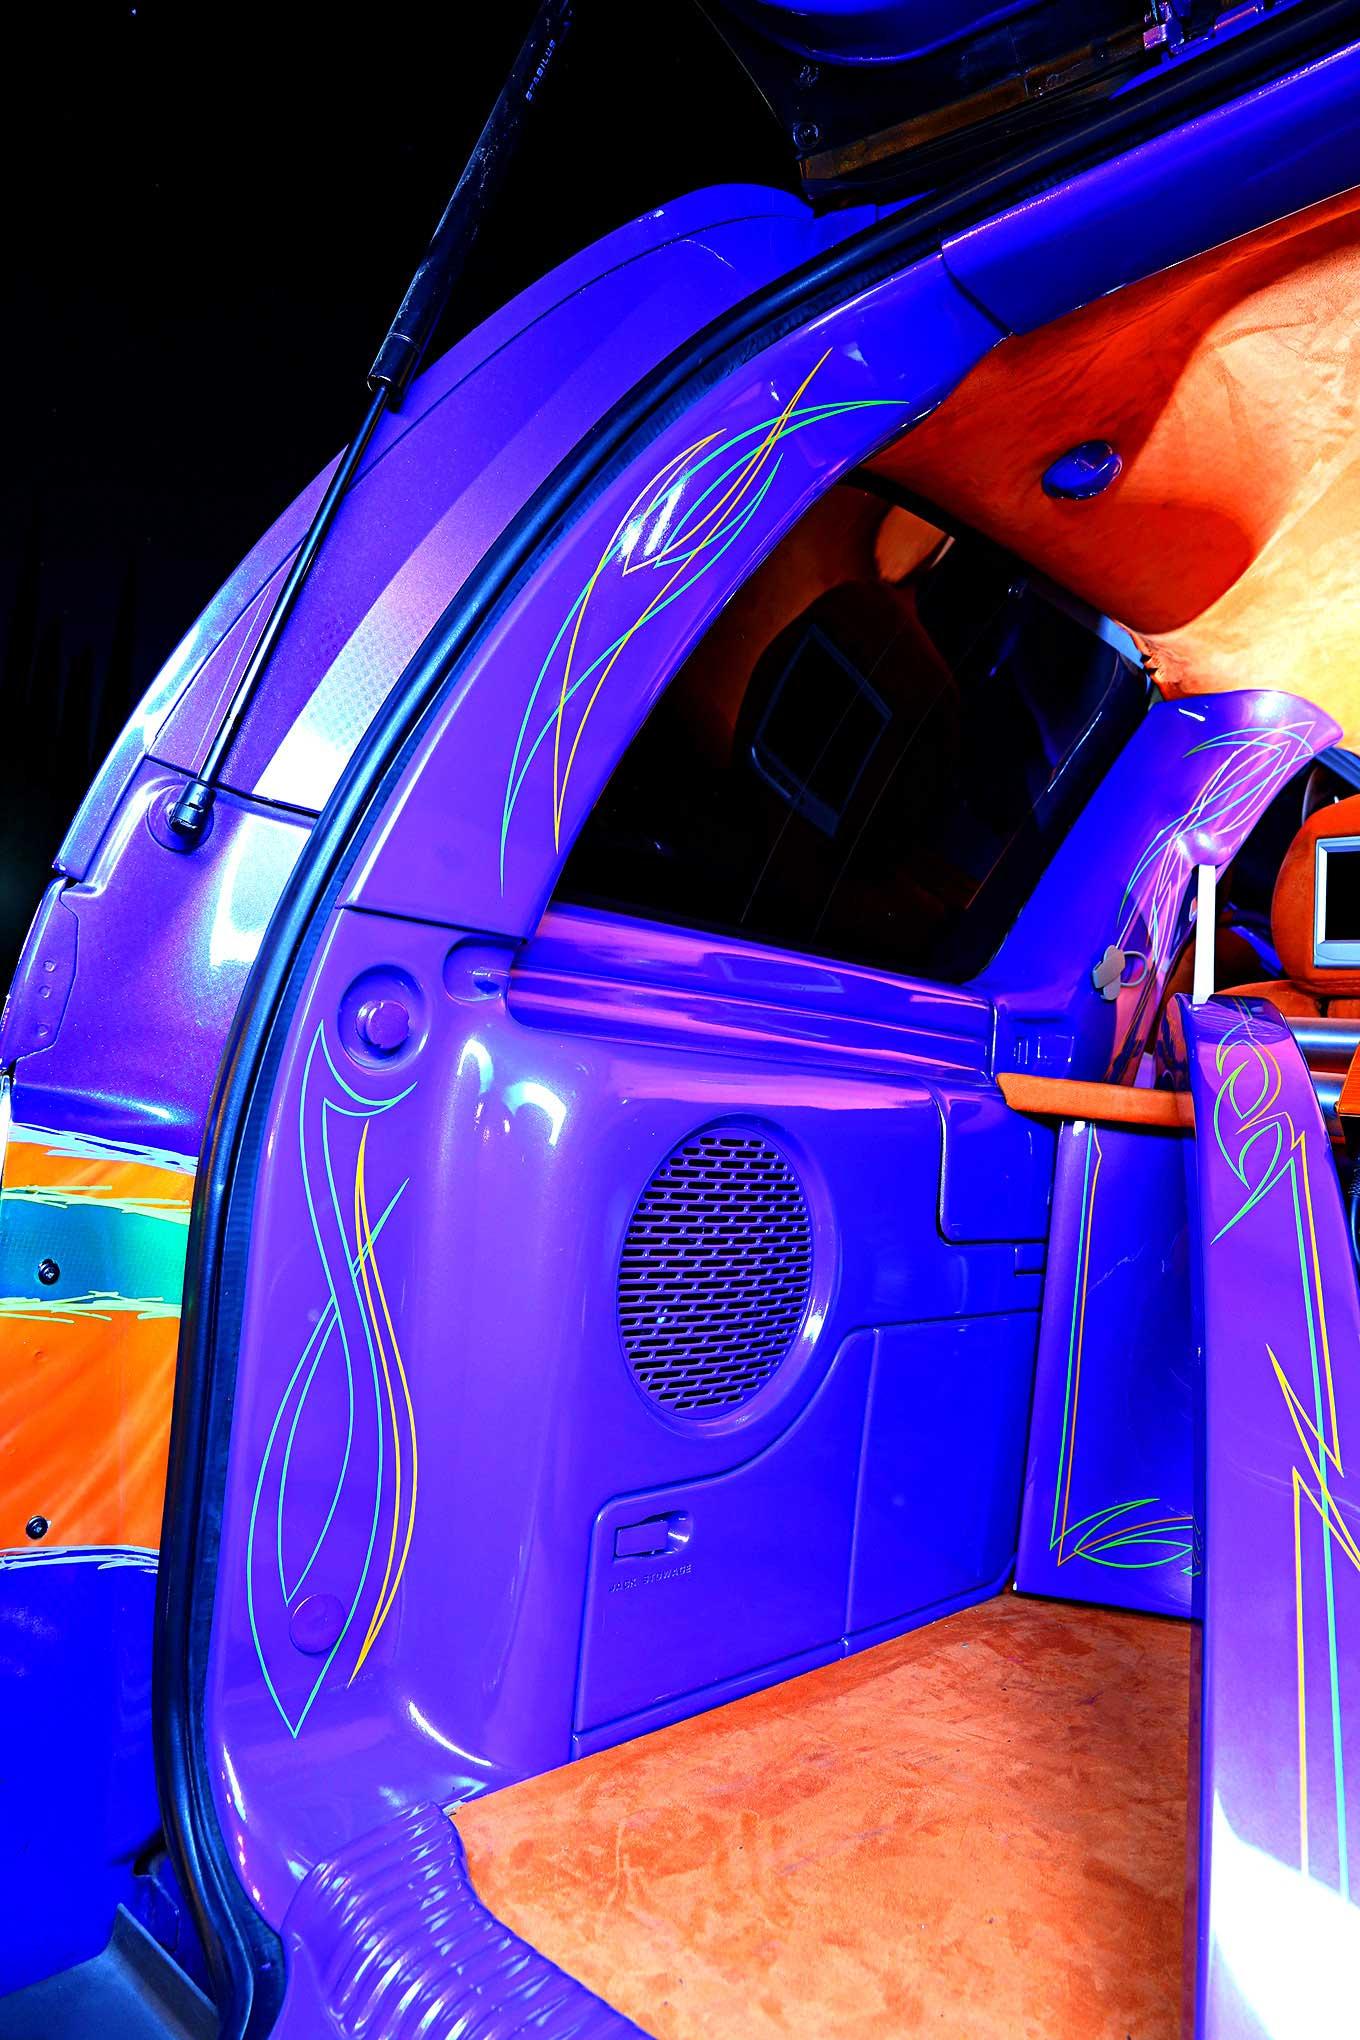 2002 cadillac escalade i 39 m leaving it stock for Cadillac escalade custom interior